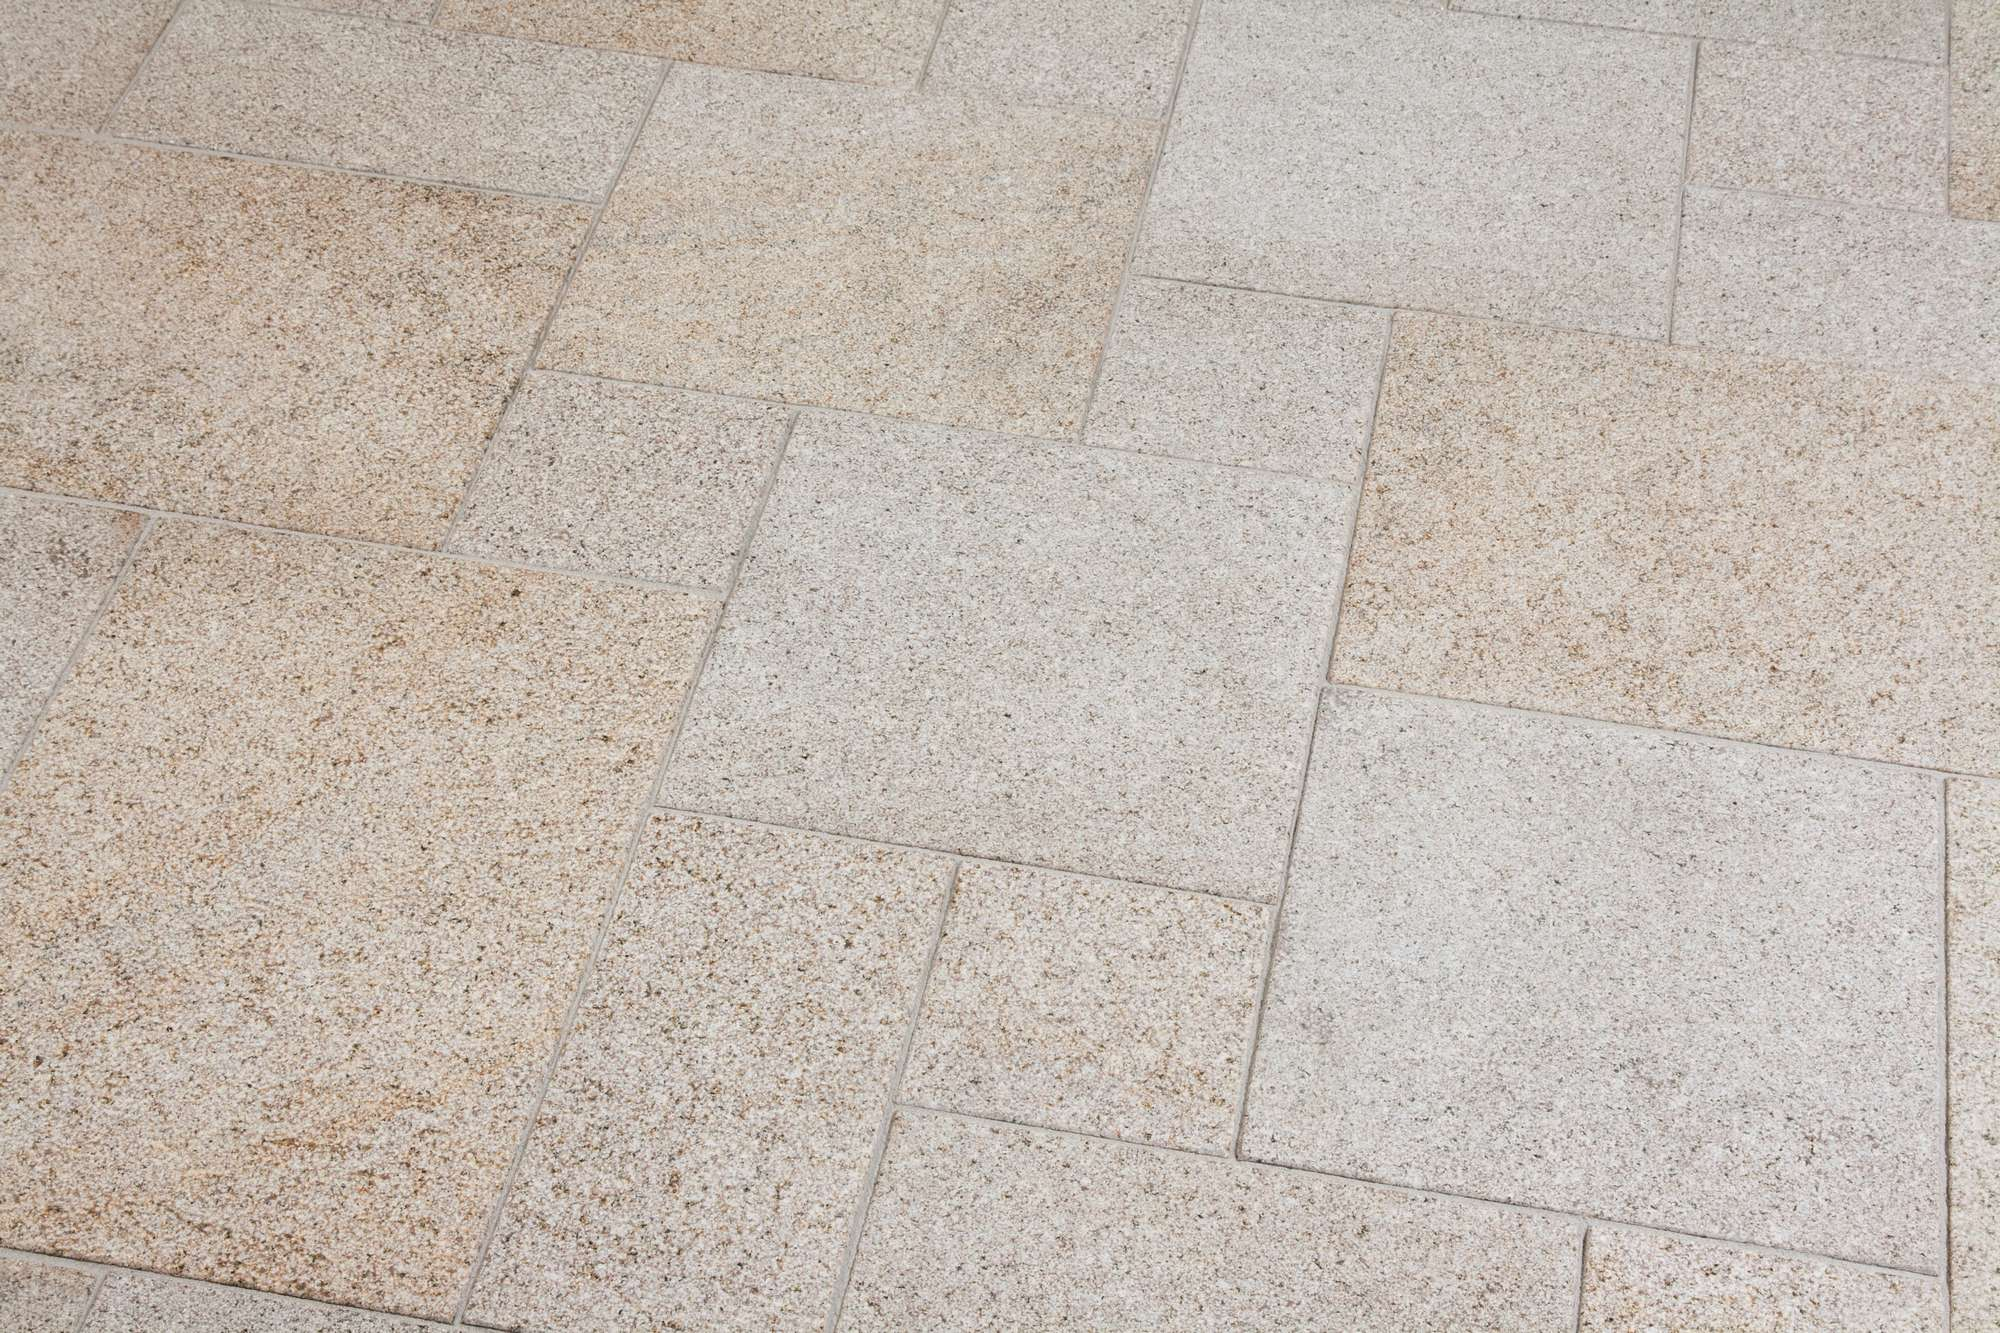 terrassenplatten granit gelb gestockt naturstein baumaterial. Black Bedroom Furniture Sets. Home Design Ideas